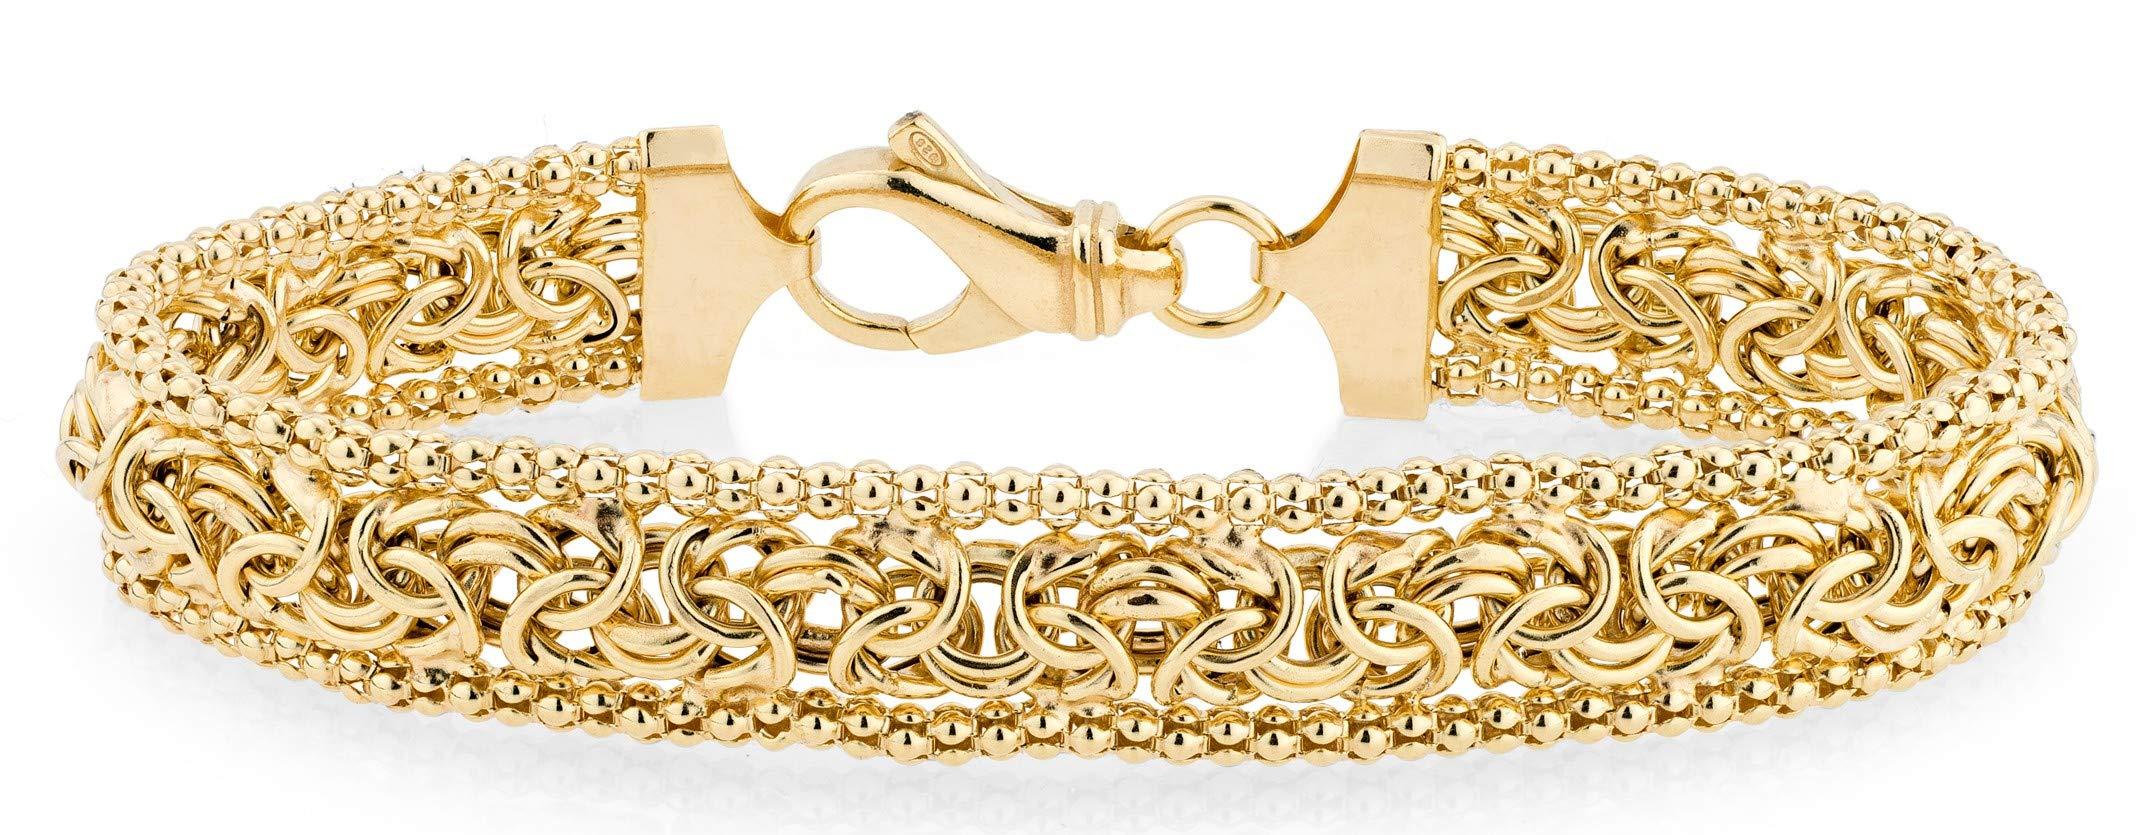 MiaBella 18K Gold Over Sterling Silver Italian Byzantine Beaded Mesh Link Chain Bracelet for Women 6.5, 7, 7.5, 8 Inch 925 Handmade in Italy (7) by MiaBella